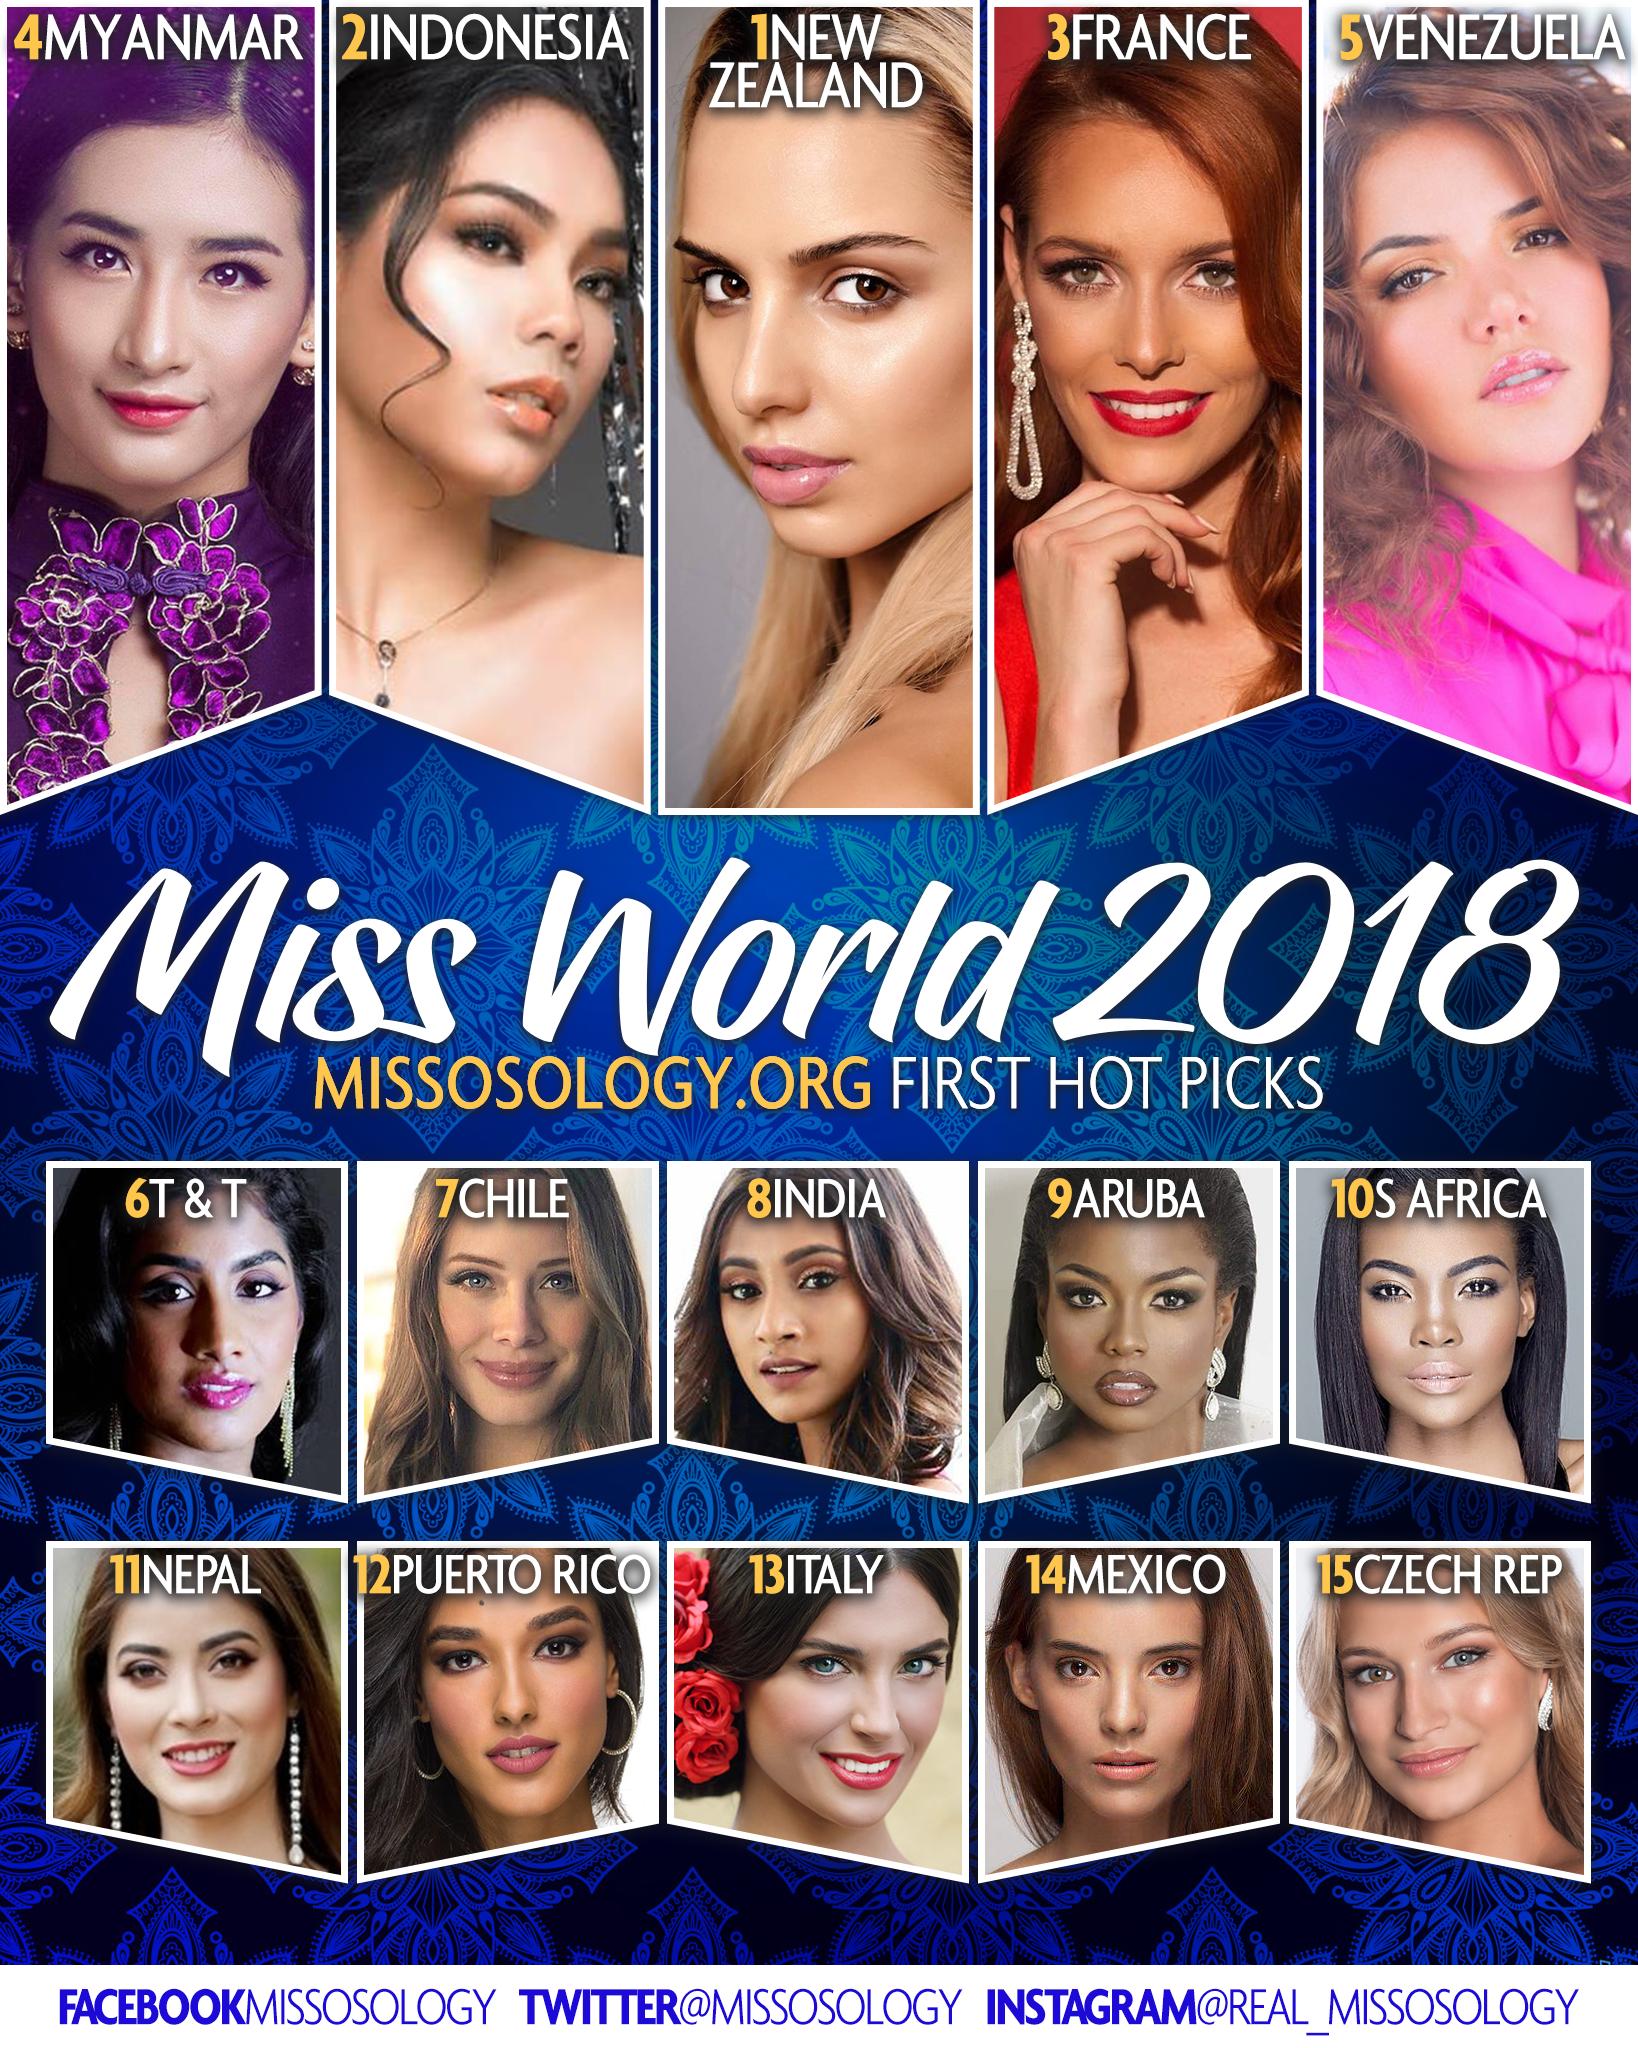 primero hot picks de missosology para miss world 2018. Misso-MW-HP-2018